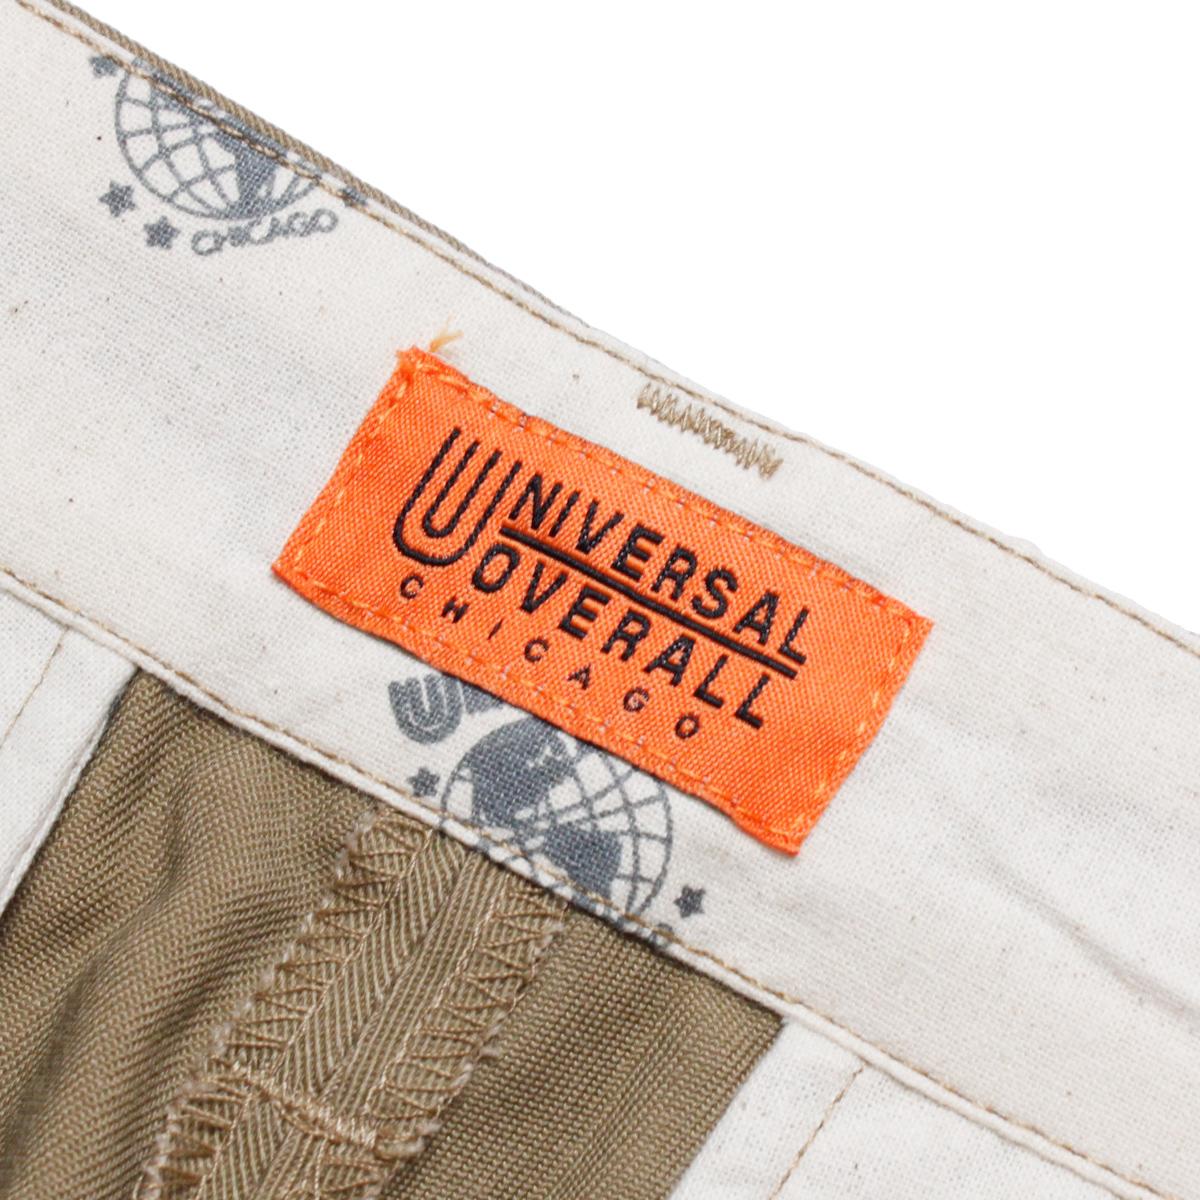 UNIVERSAL OVERALL ユニバーサルオーバーオール OFFICER PANTS